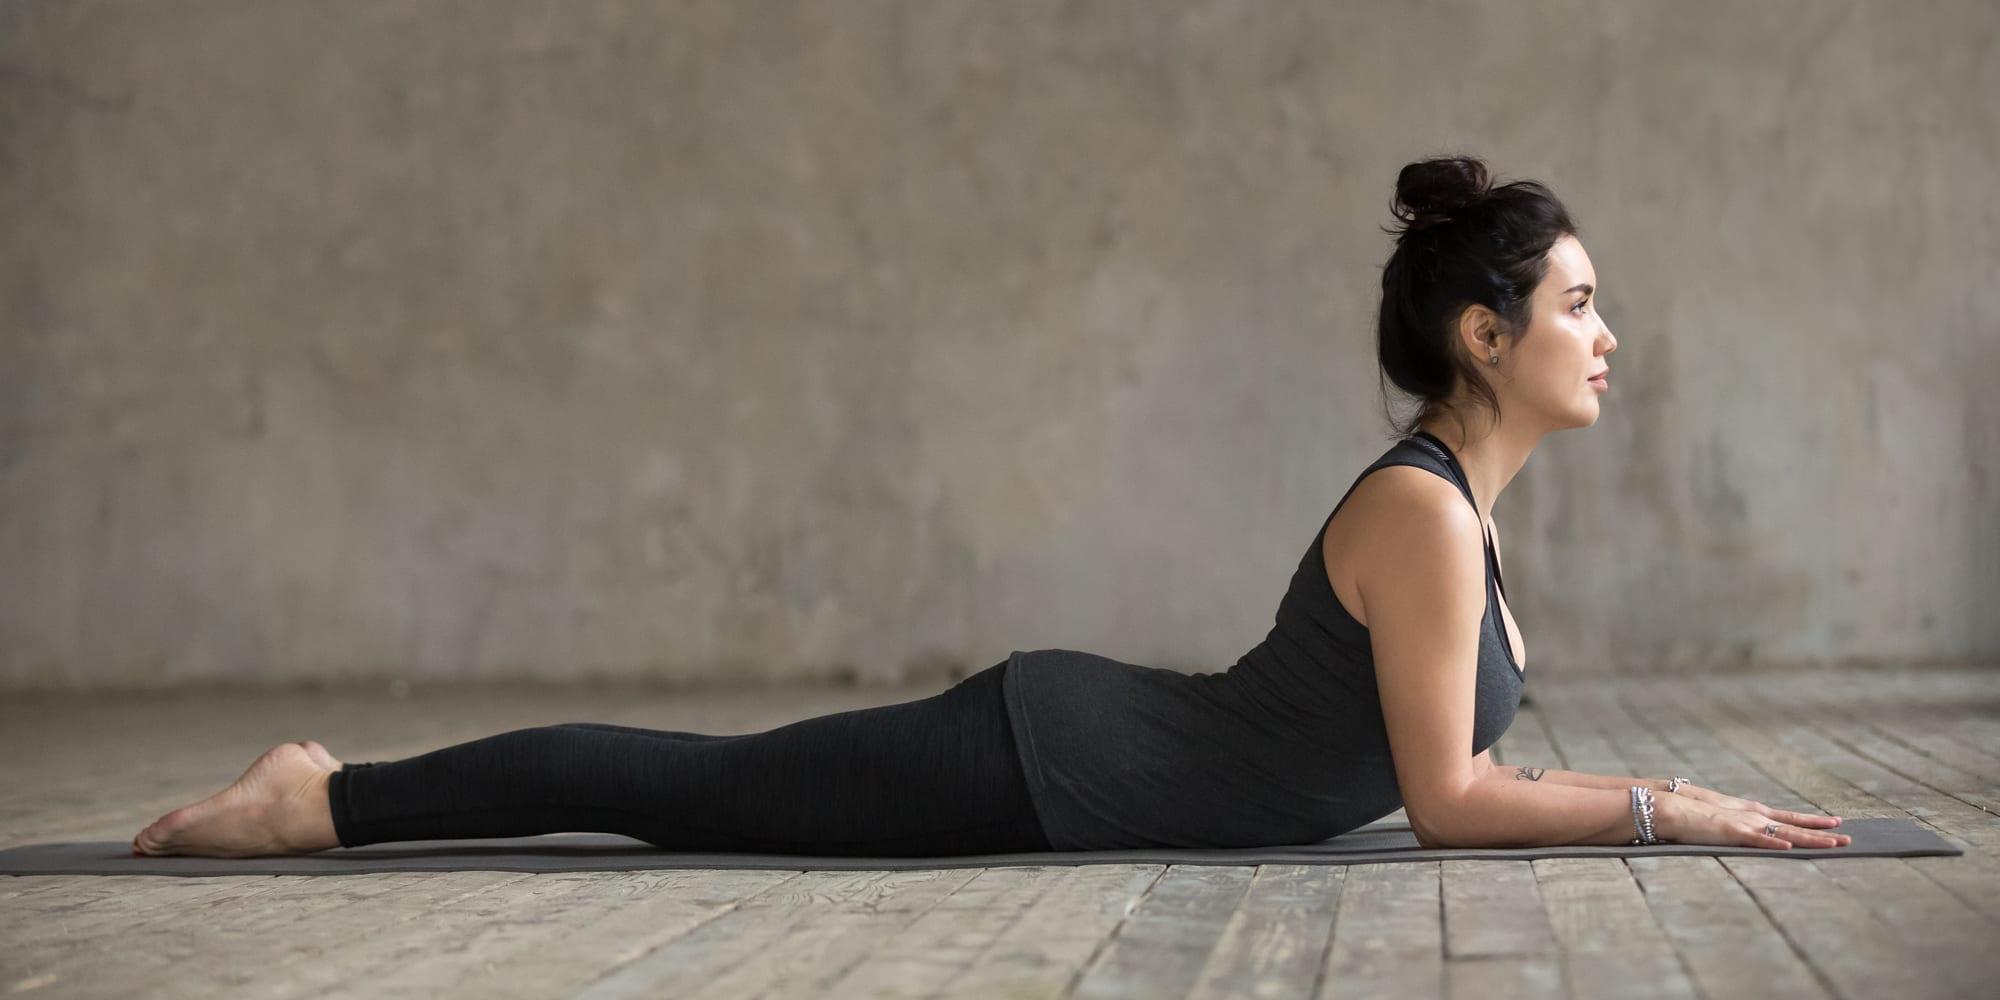 How To Do A Pilates Leg Kick